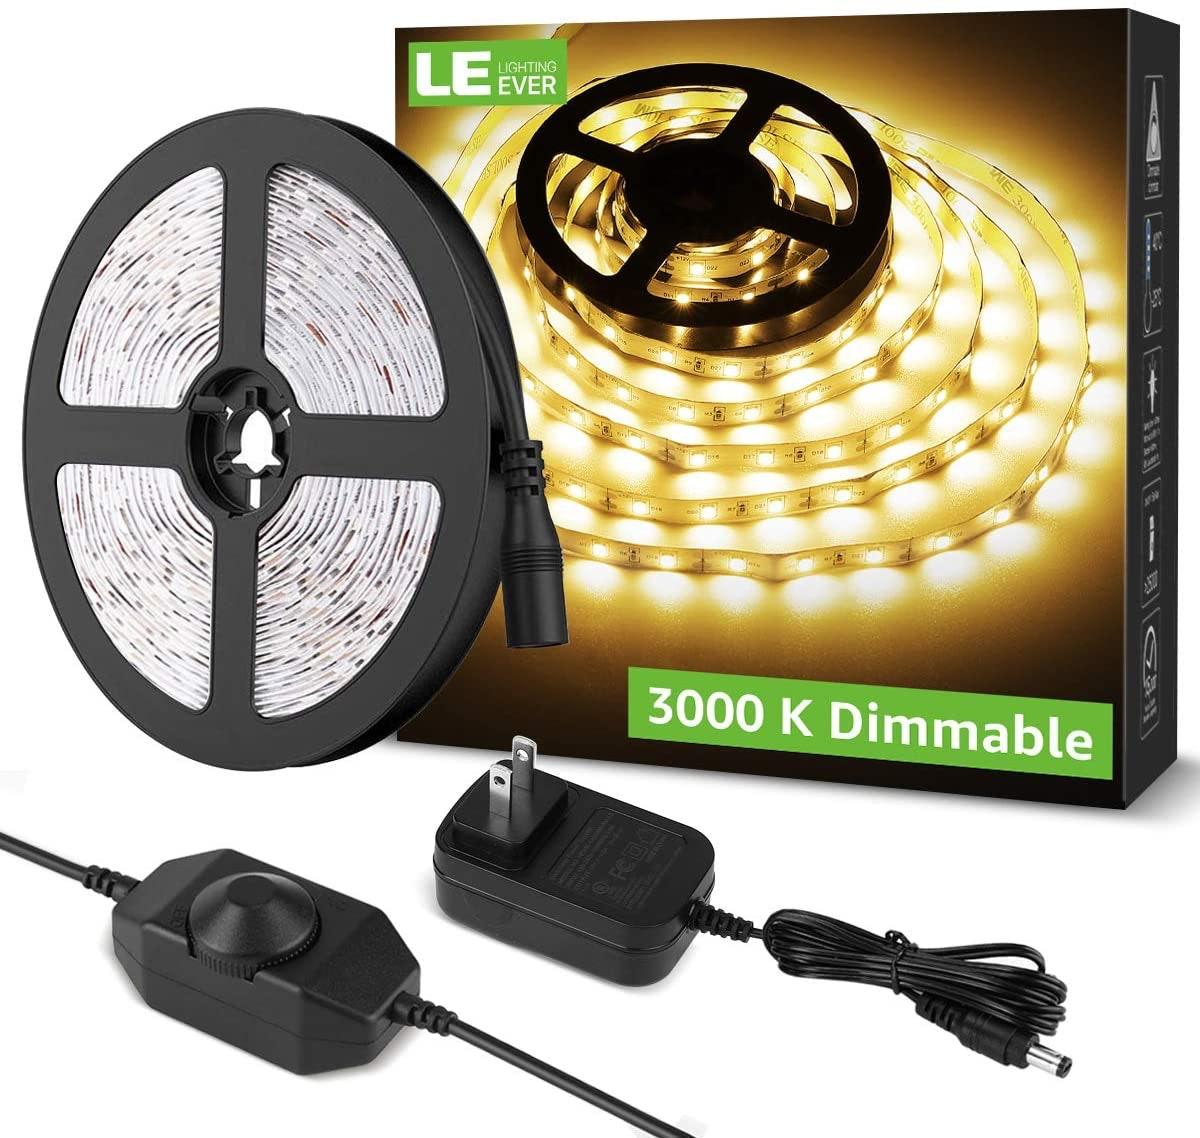 LE LED Strip Light